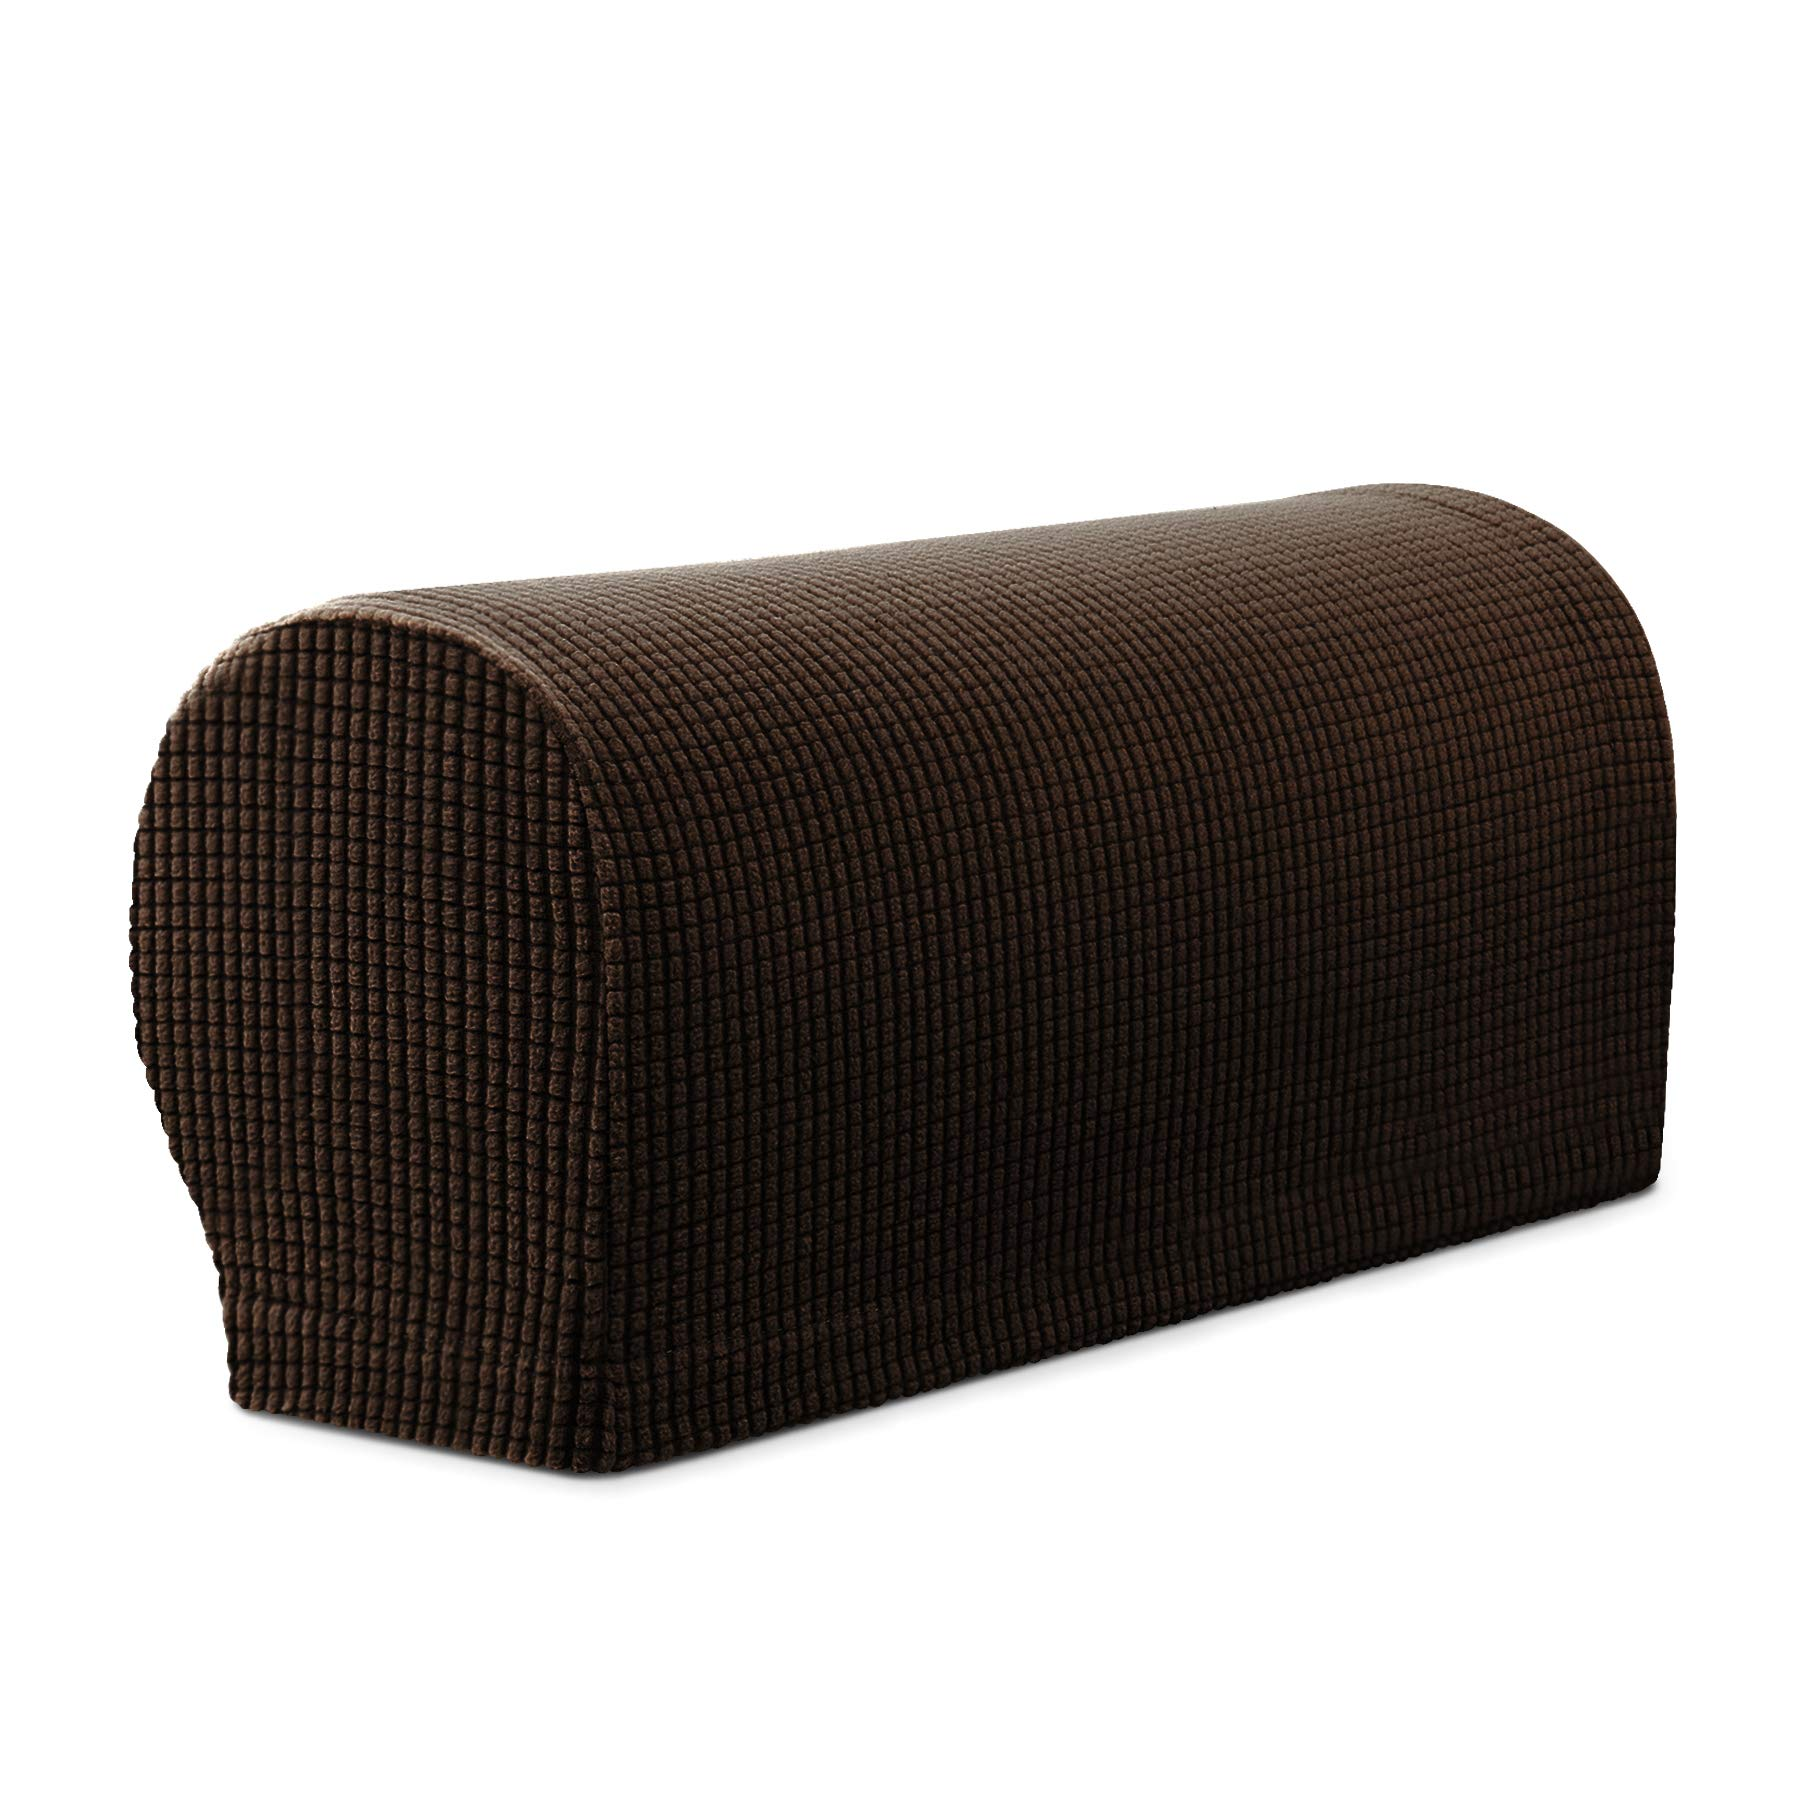 Subrtex Spandex Stretch Armrest Covers Set of 2 (Chocolate) by Subrtex